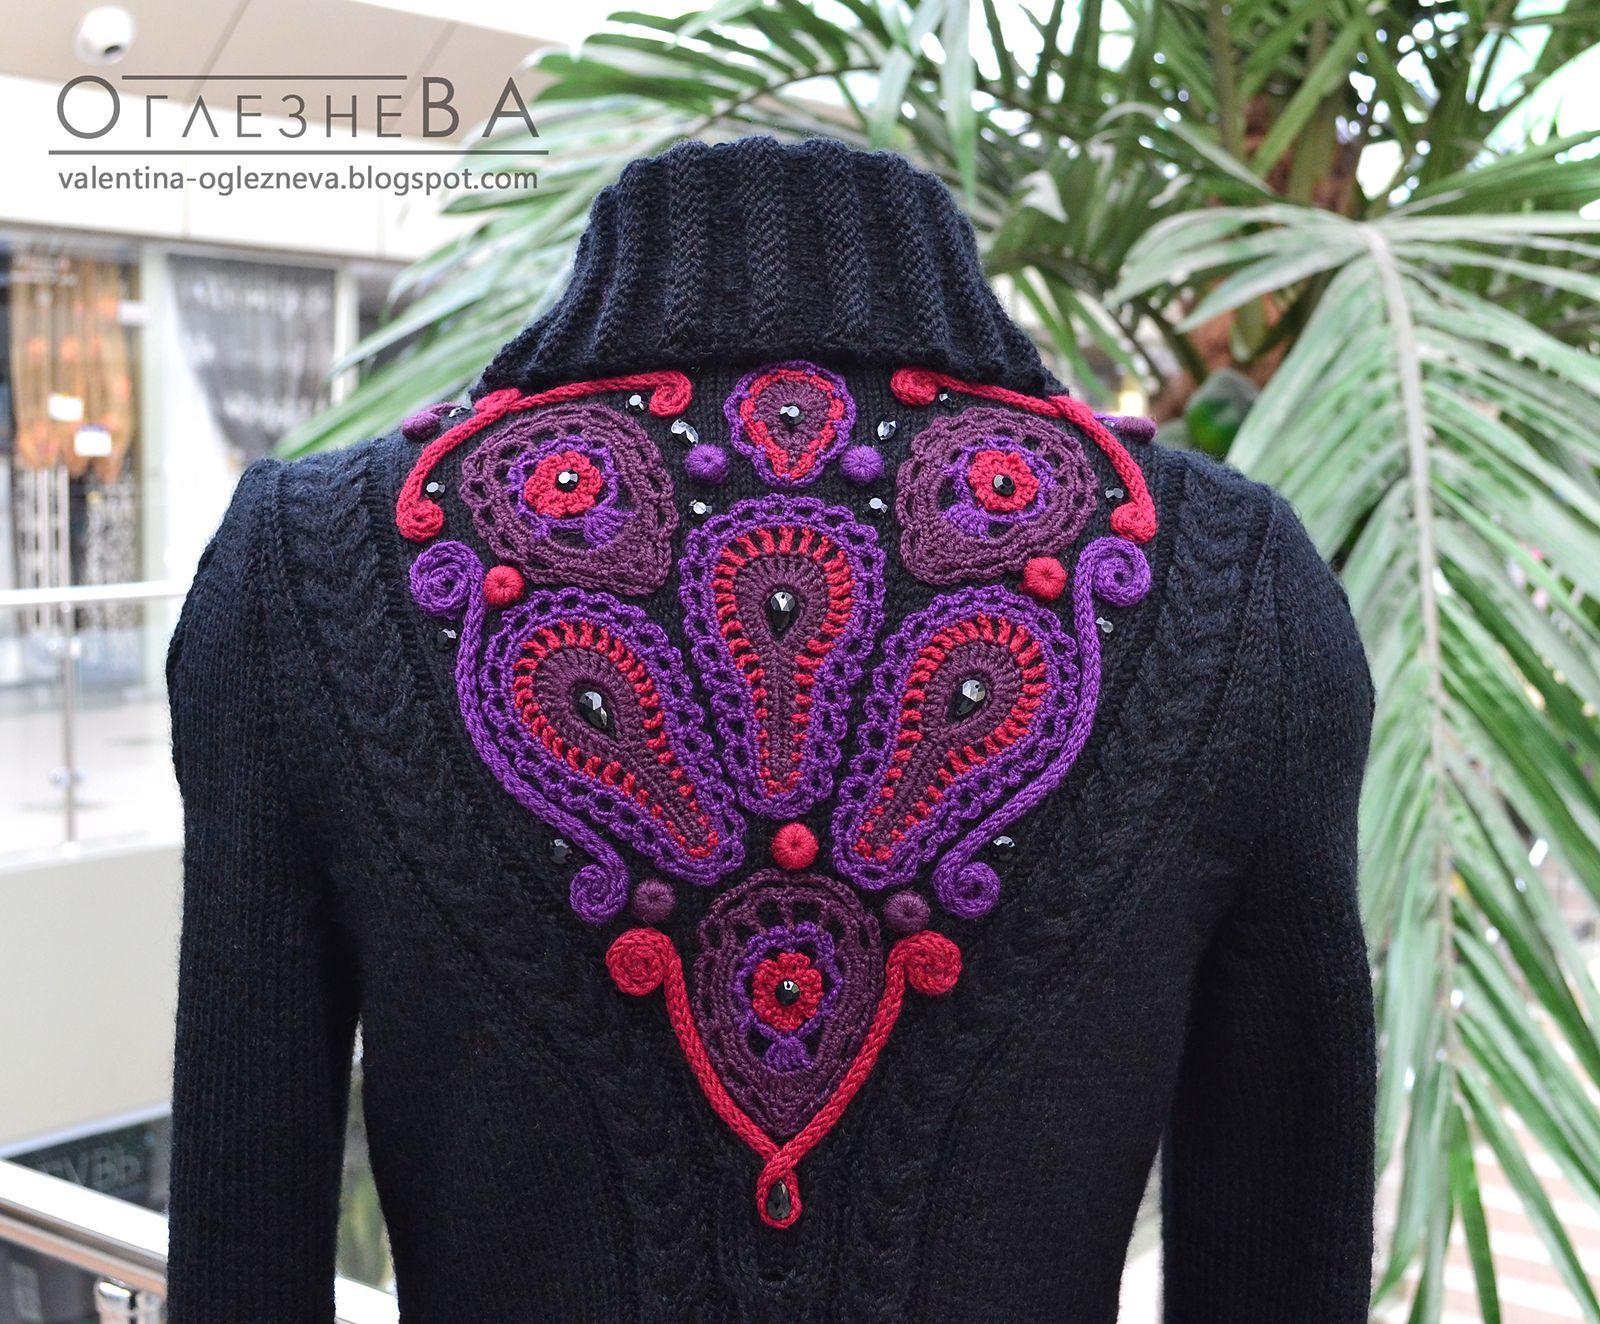 OglezneVA's Peacock's tail - knit coat with crochet elements #crochetelements